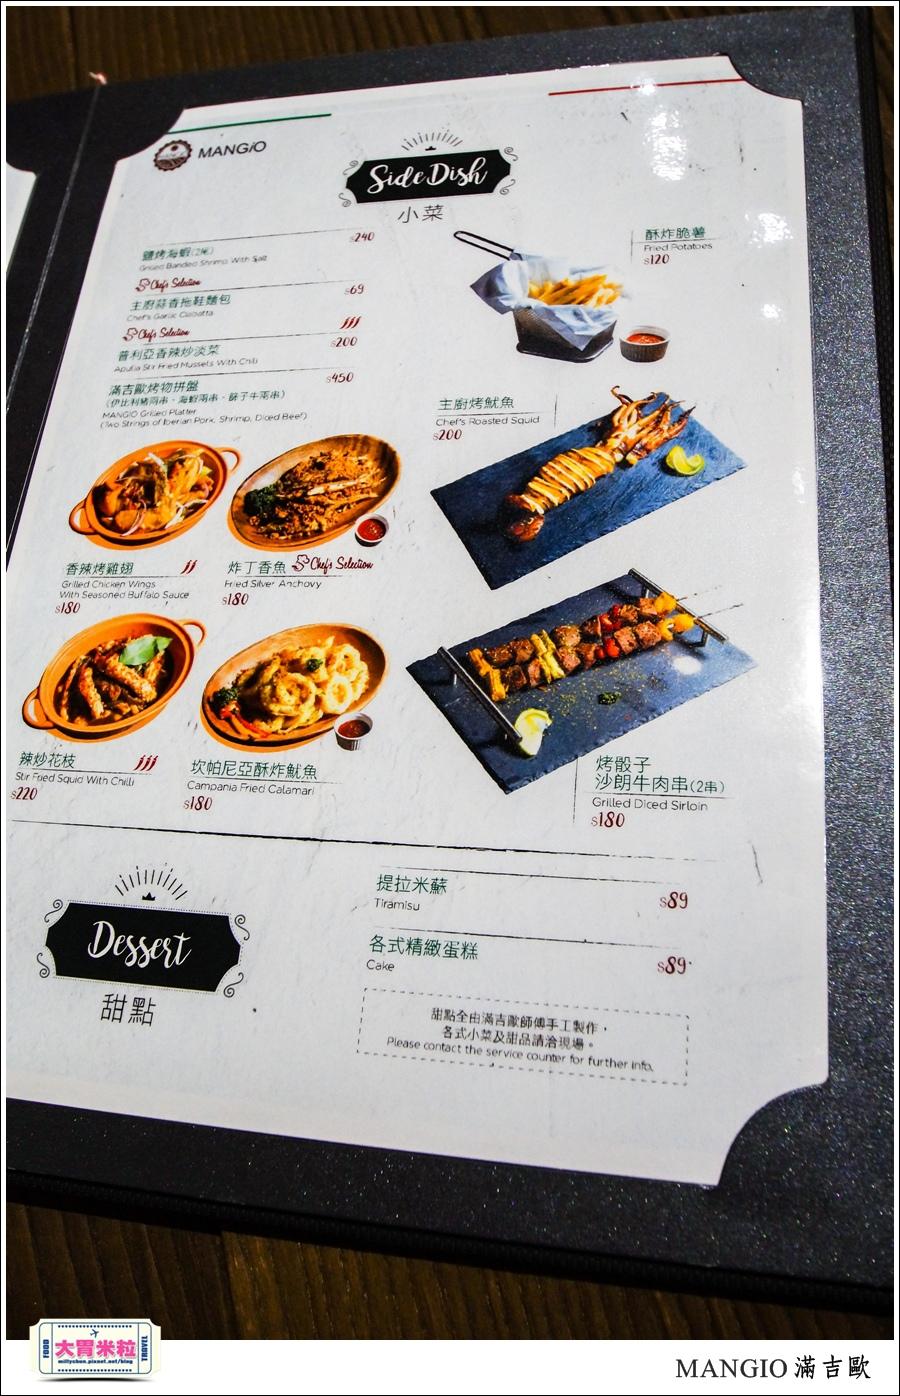 MANGiO Bistro 滿吉歐義式樂活餐酒館@台北餐酒館推薦@大胃米粒0064.jpg